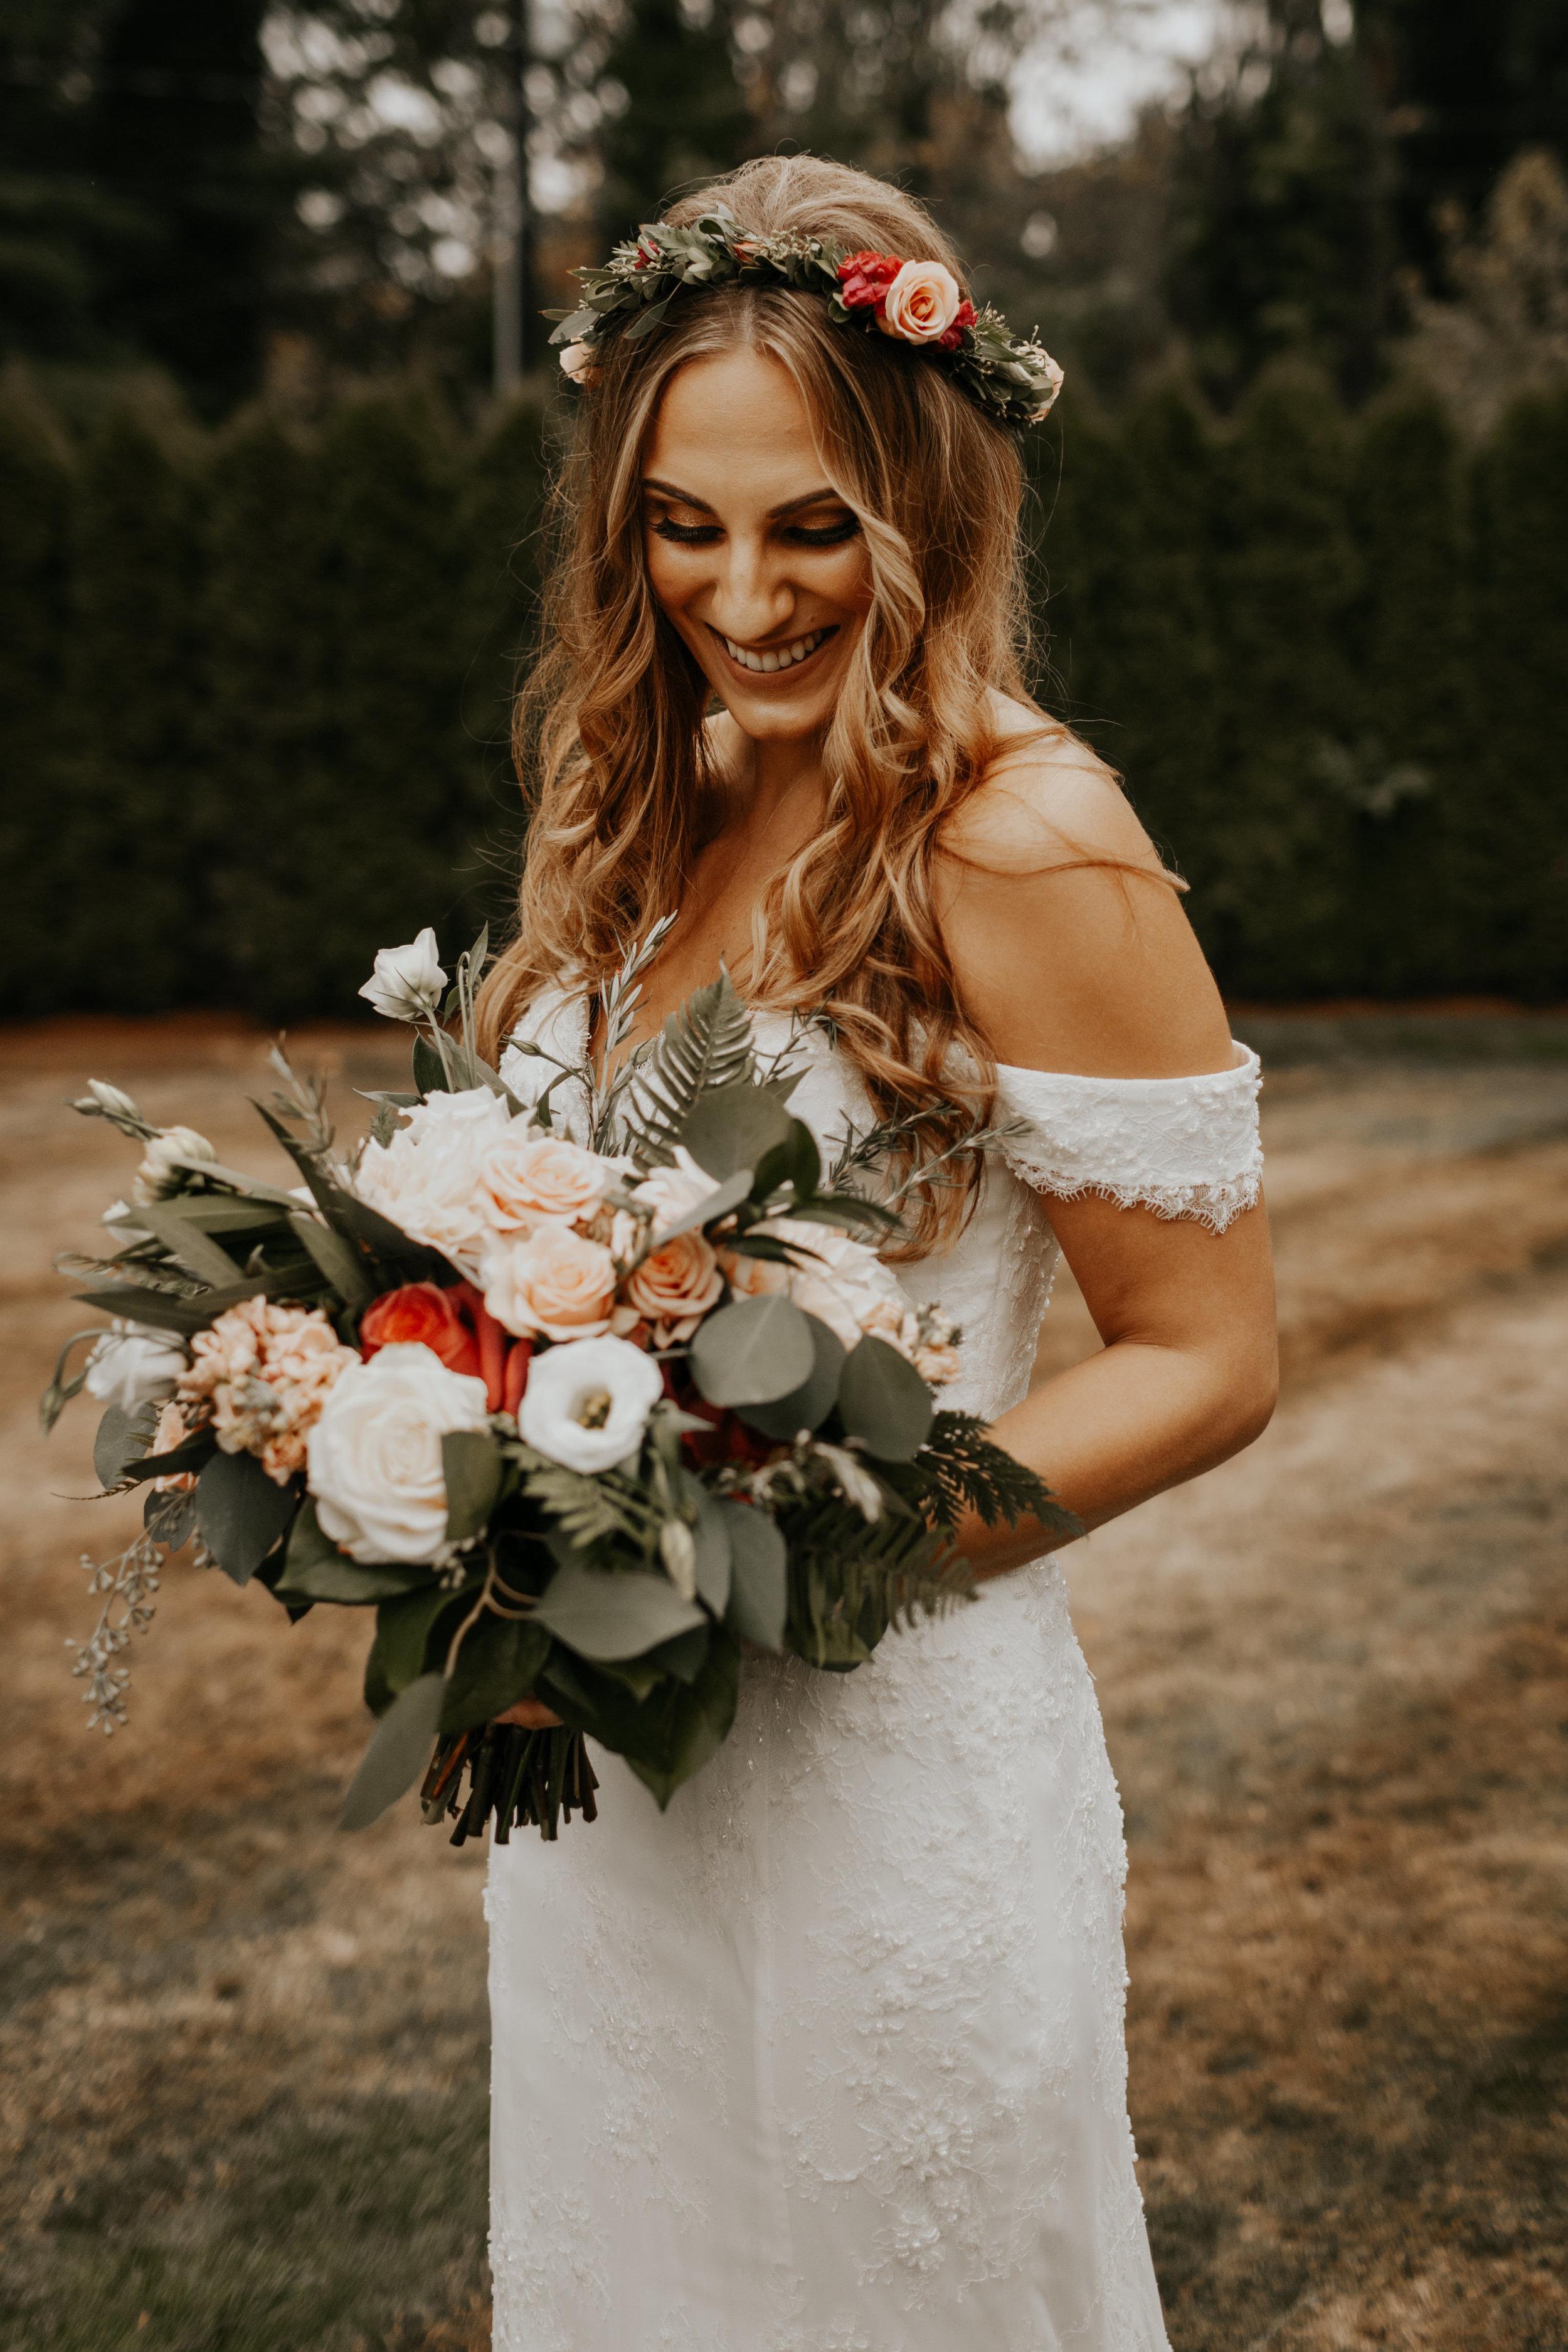 ginapaulson_jakitrevor_wedding-129.jpg